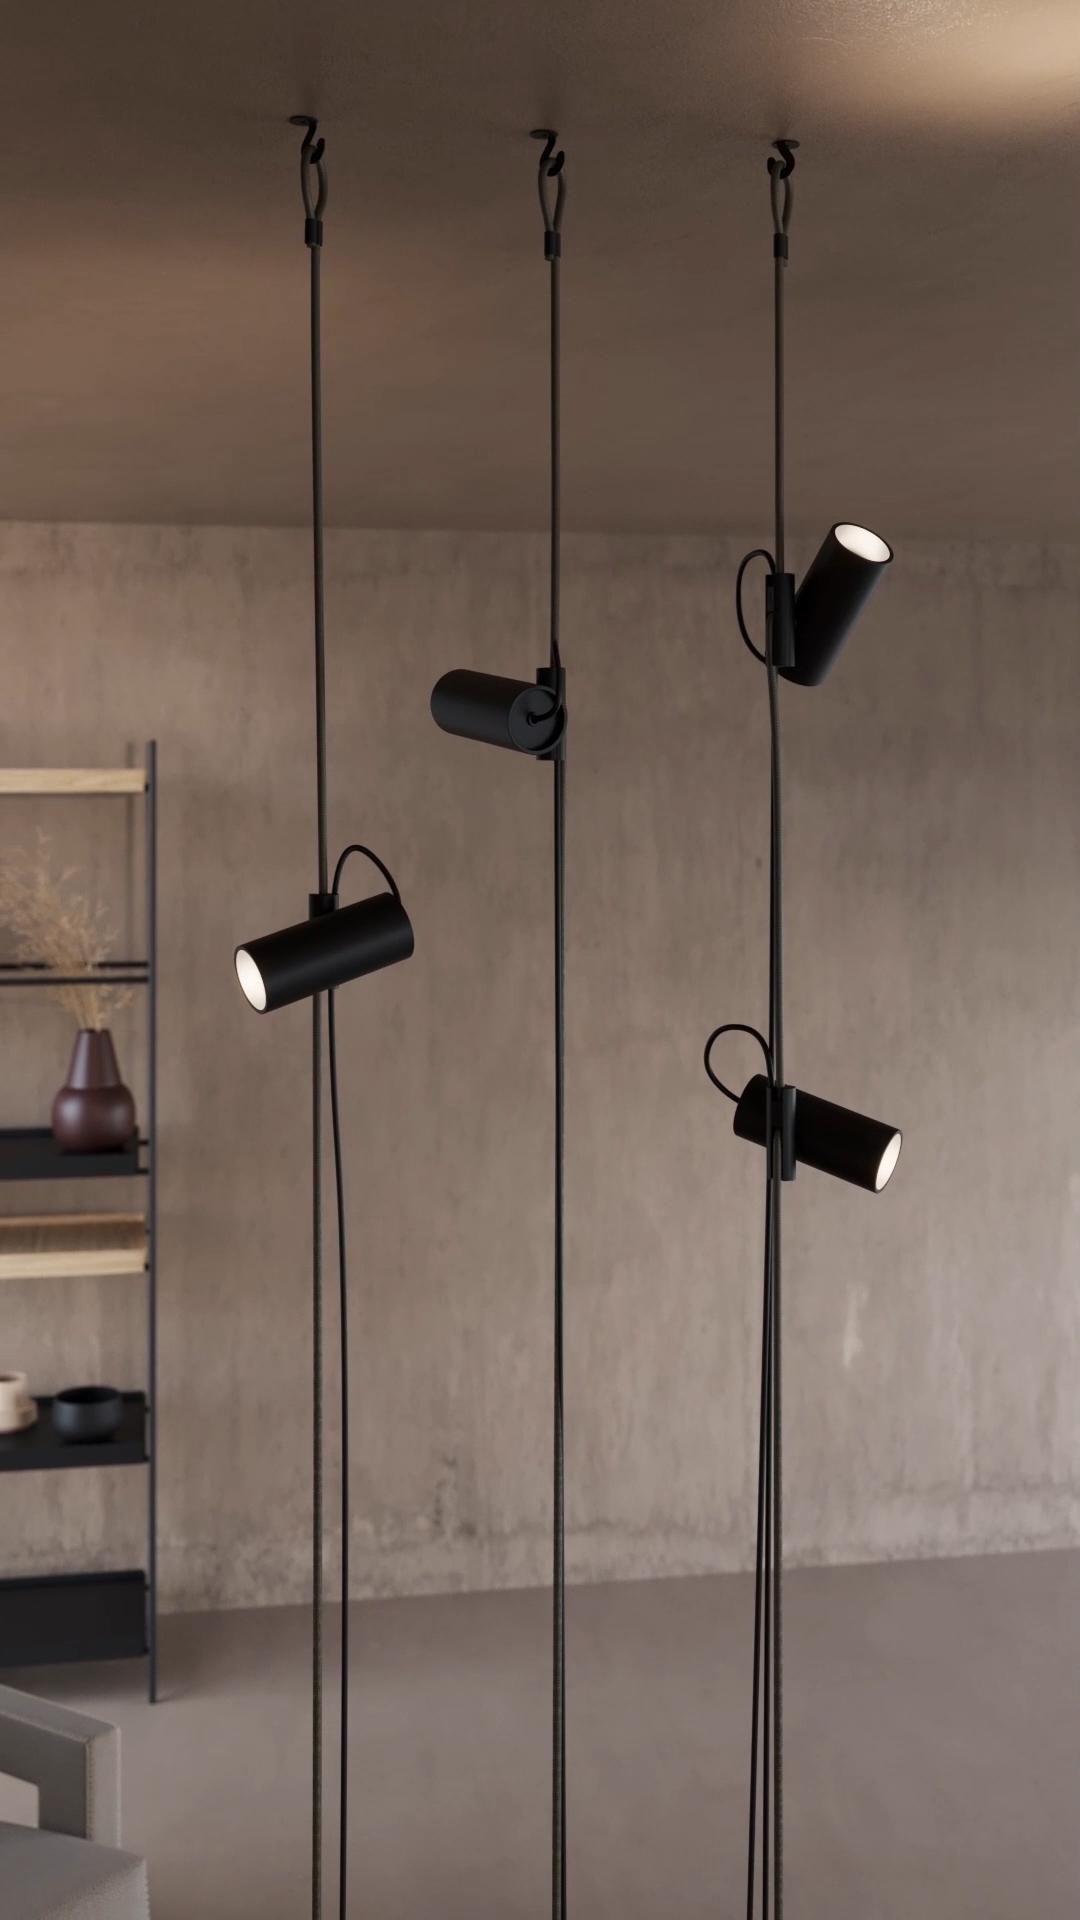 Cima, design by Marco Dessí, 2021, Floor Lamp